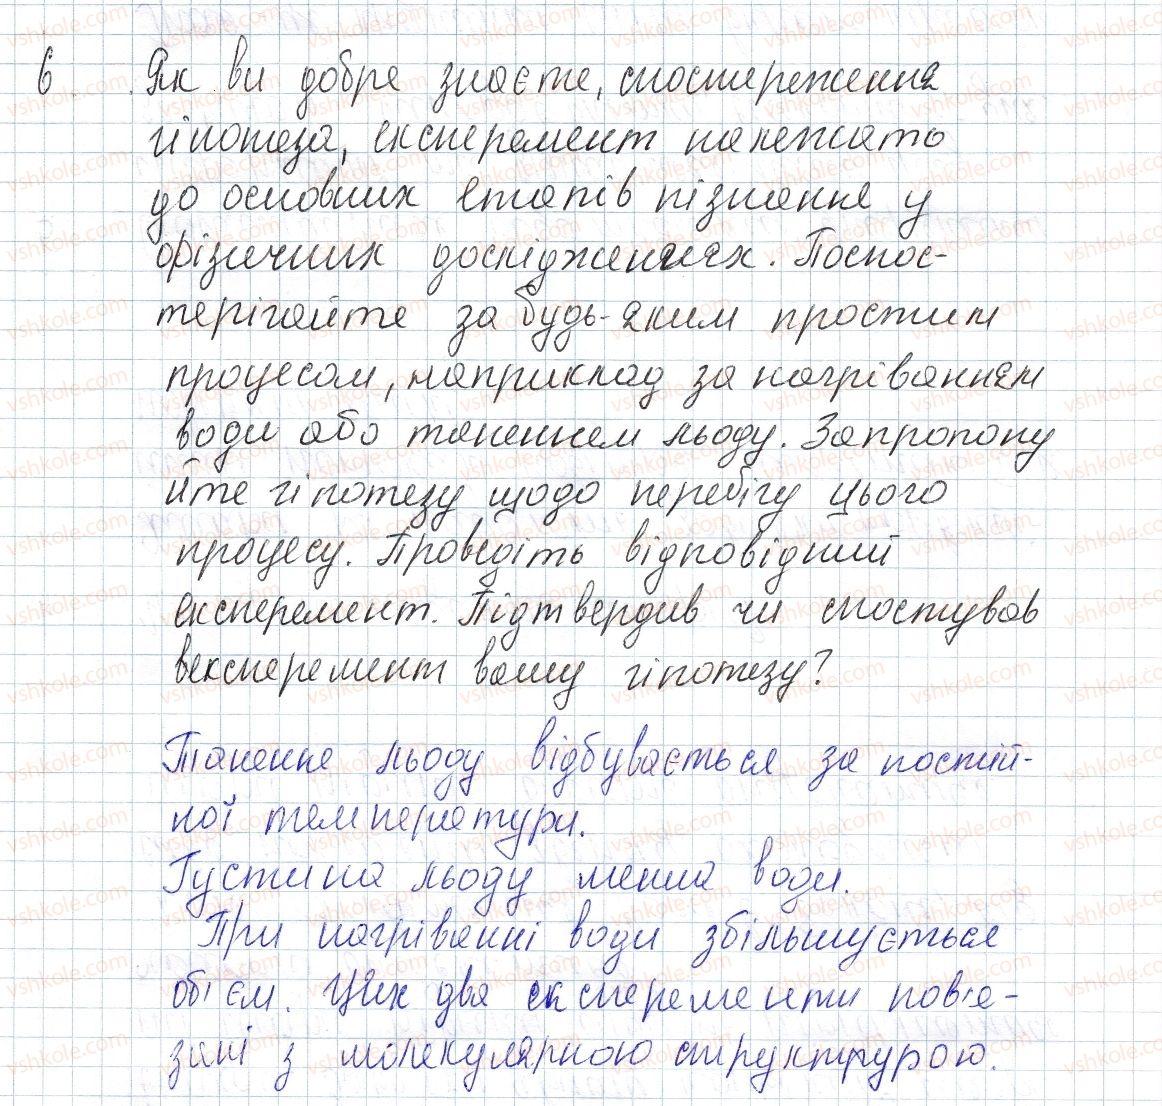 8-fizika-vg-baryahtar-fya-bozhinova-so-dovgij-oo-kiryuhina-2016--vpravi-6-6.jpg